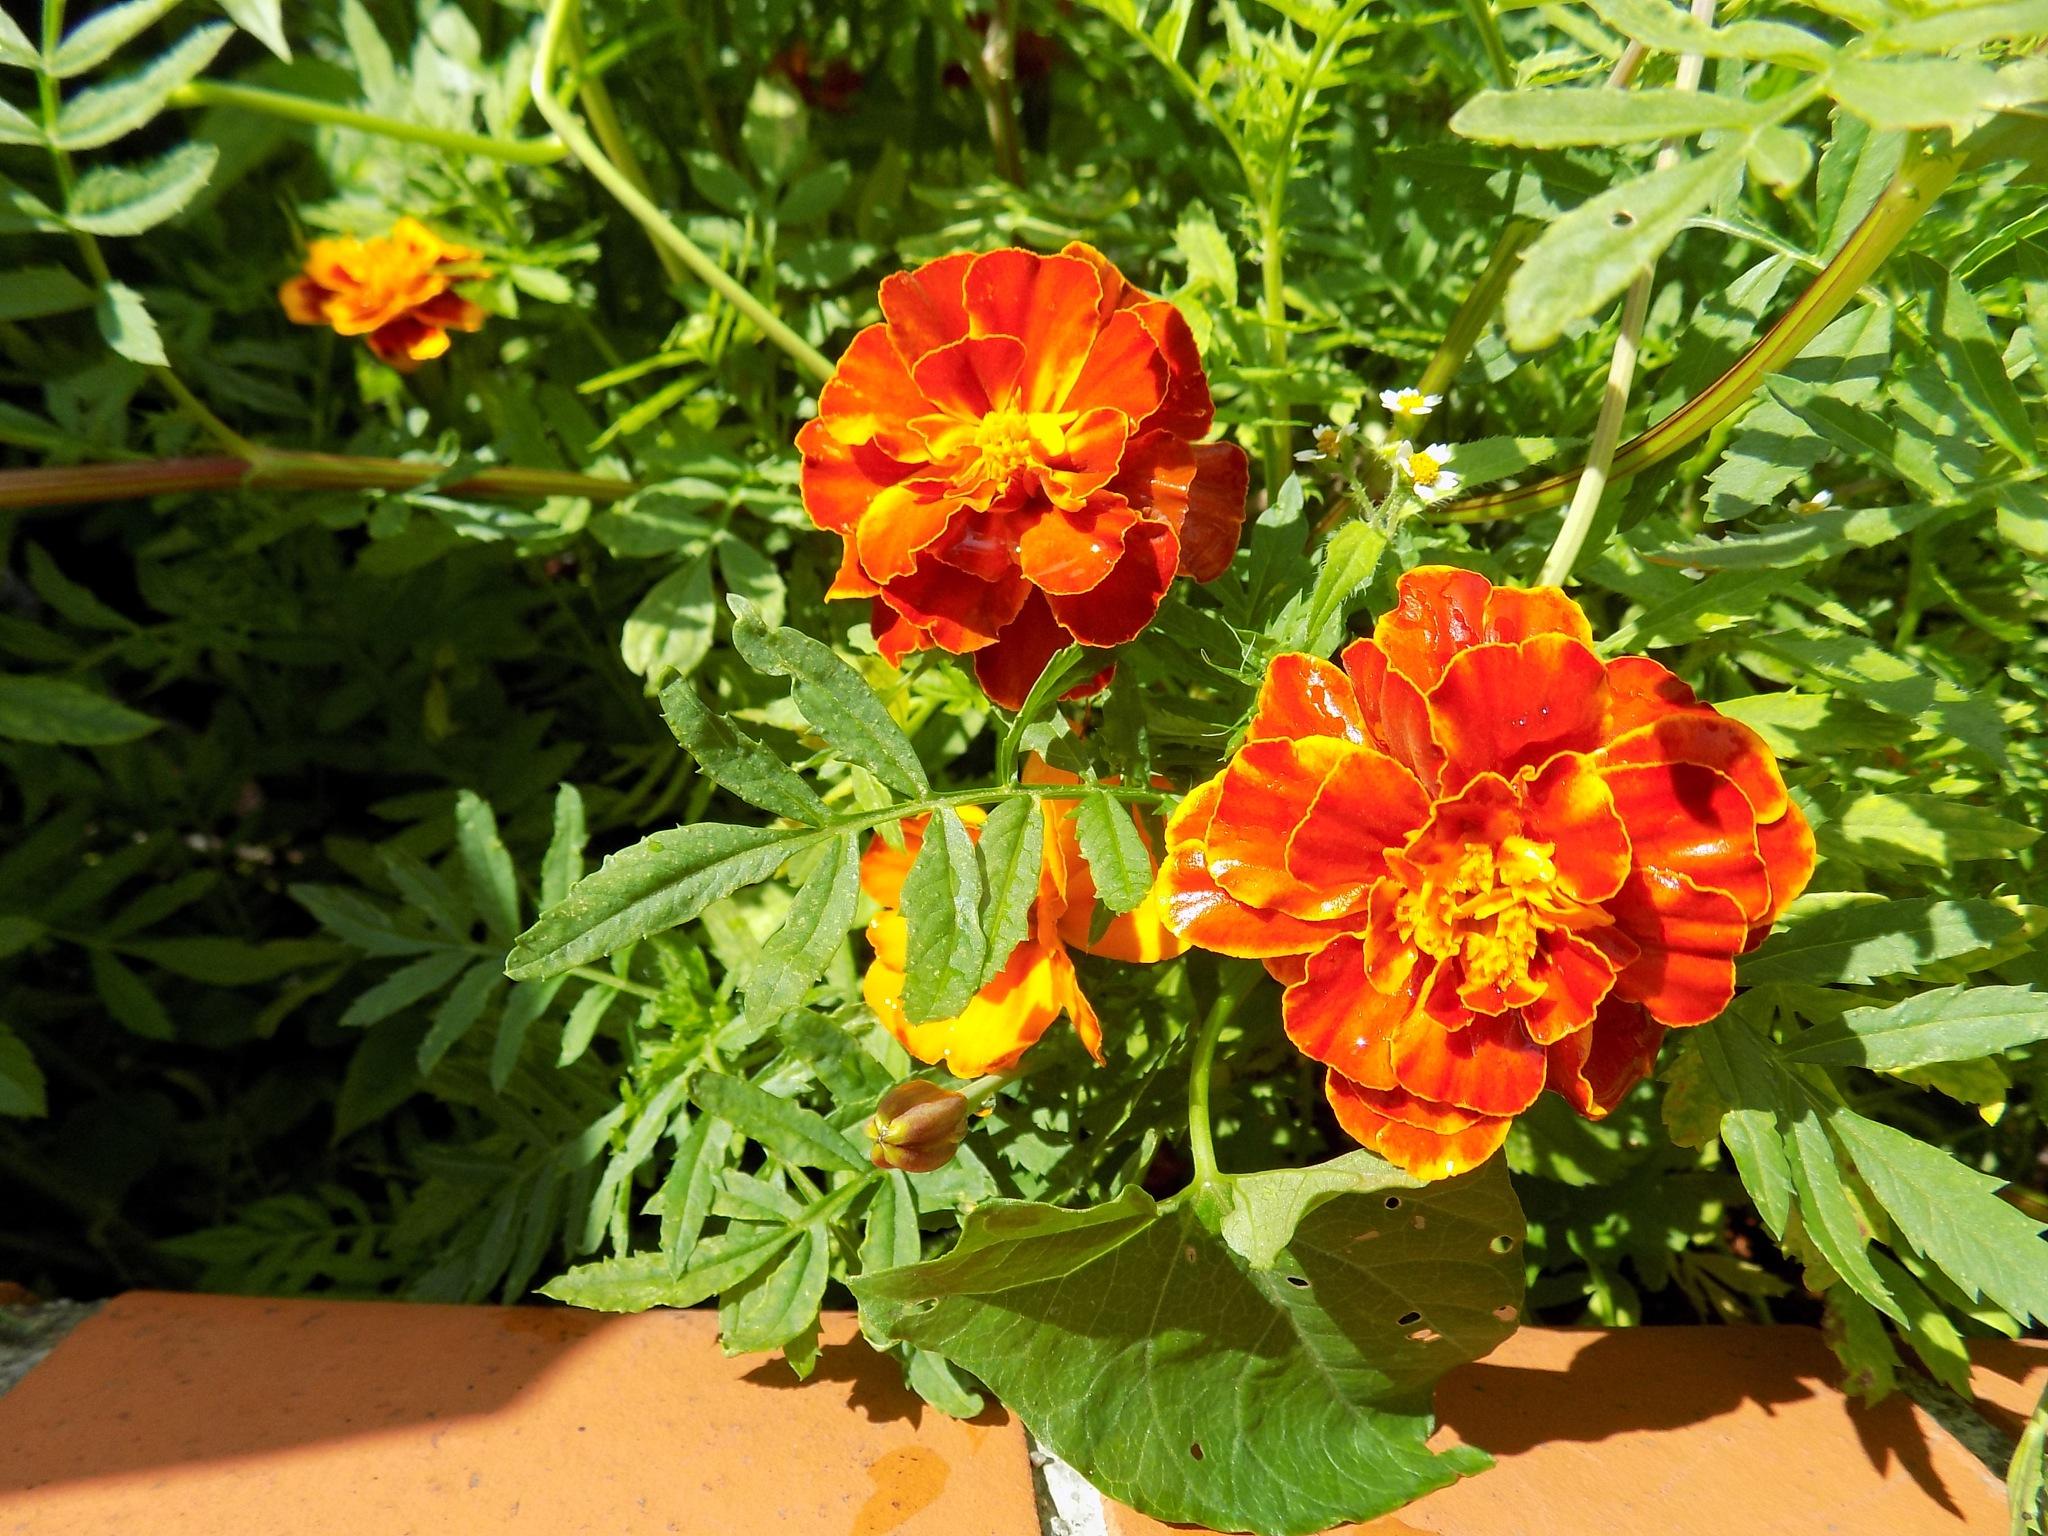 Marigold by uzkuraitiene62